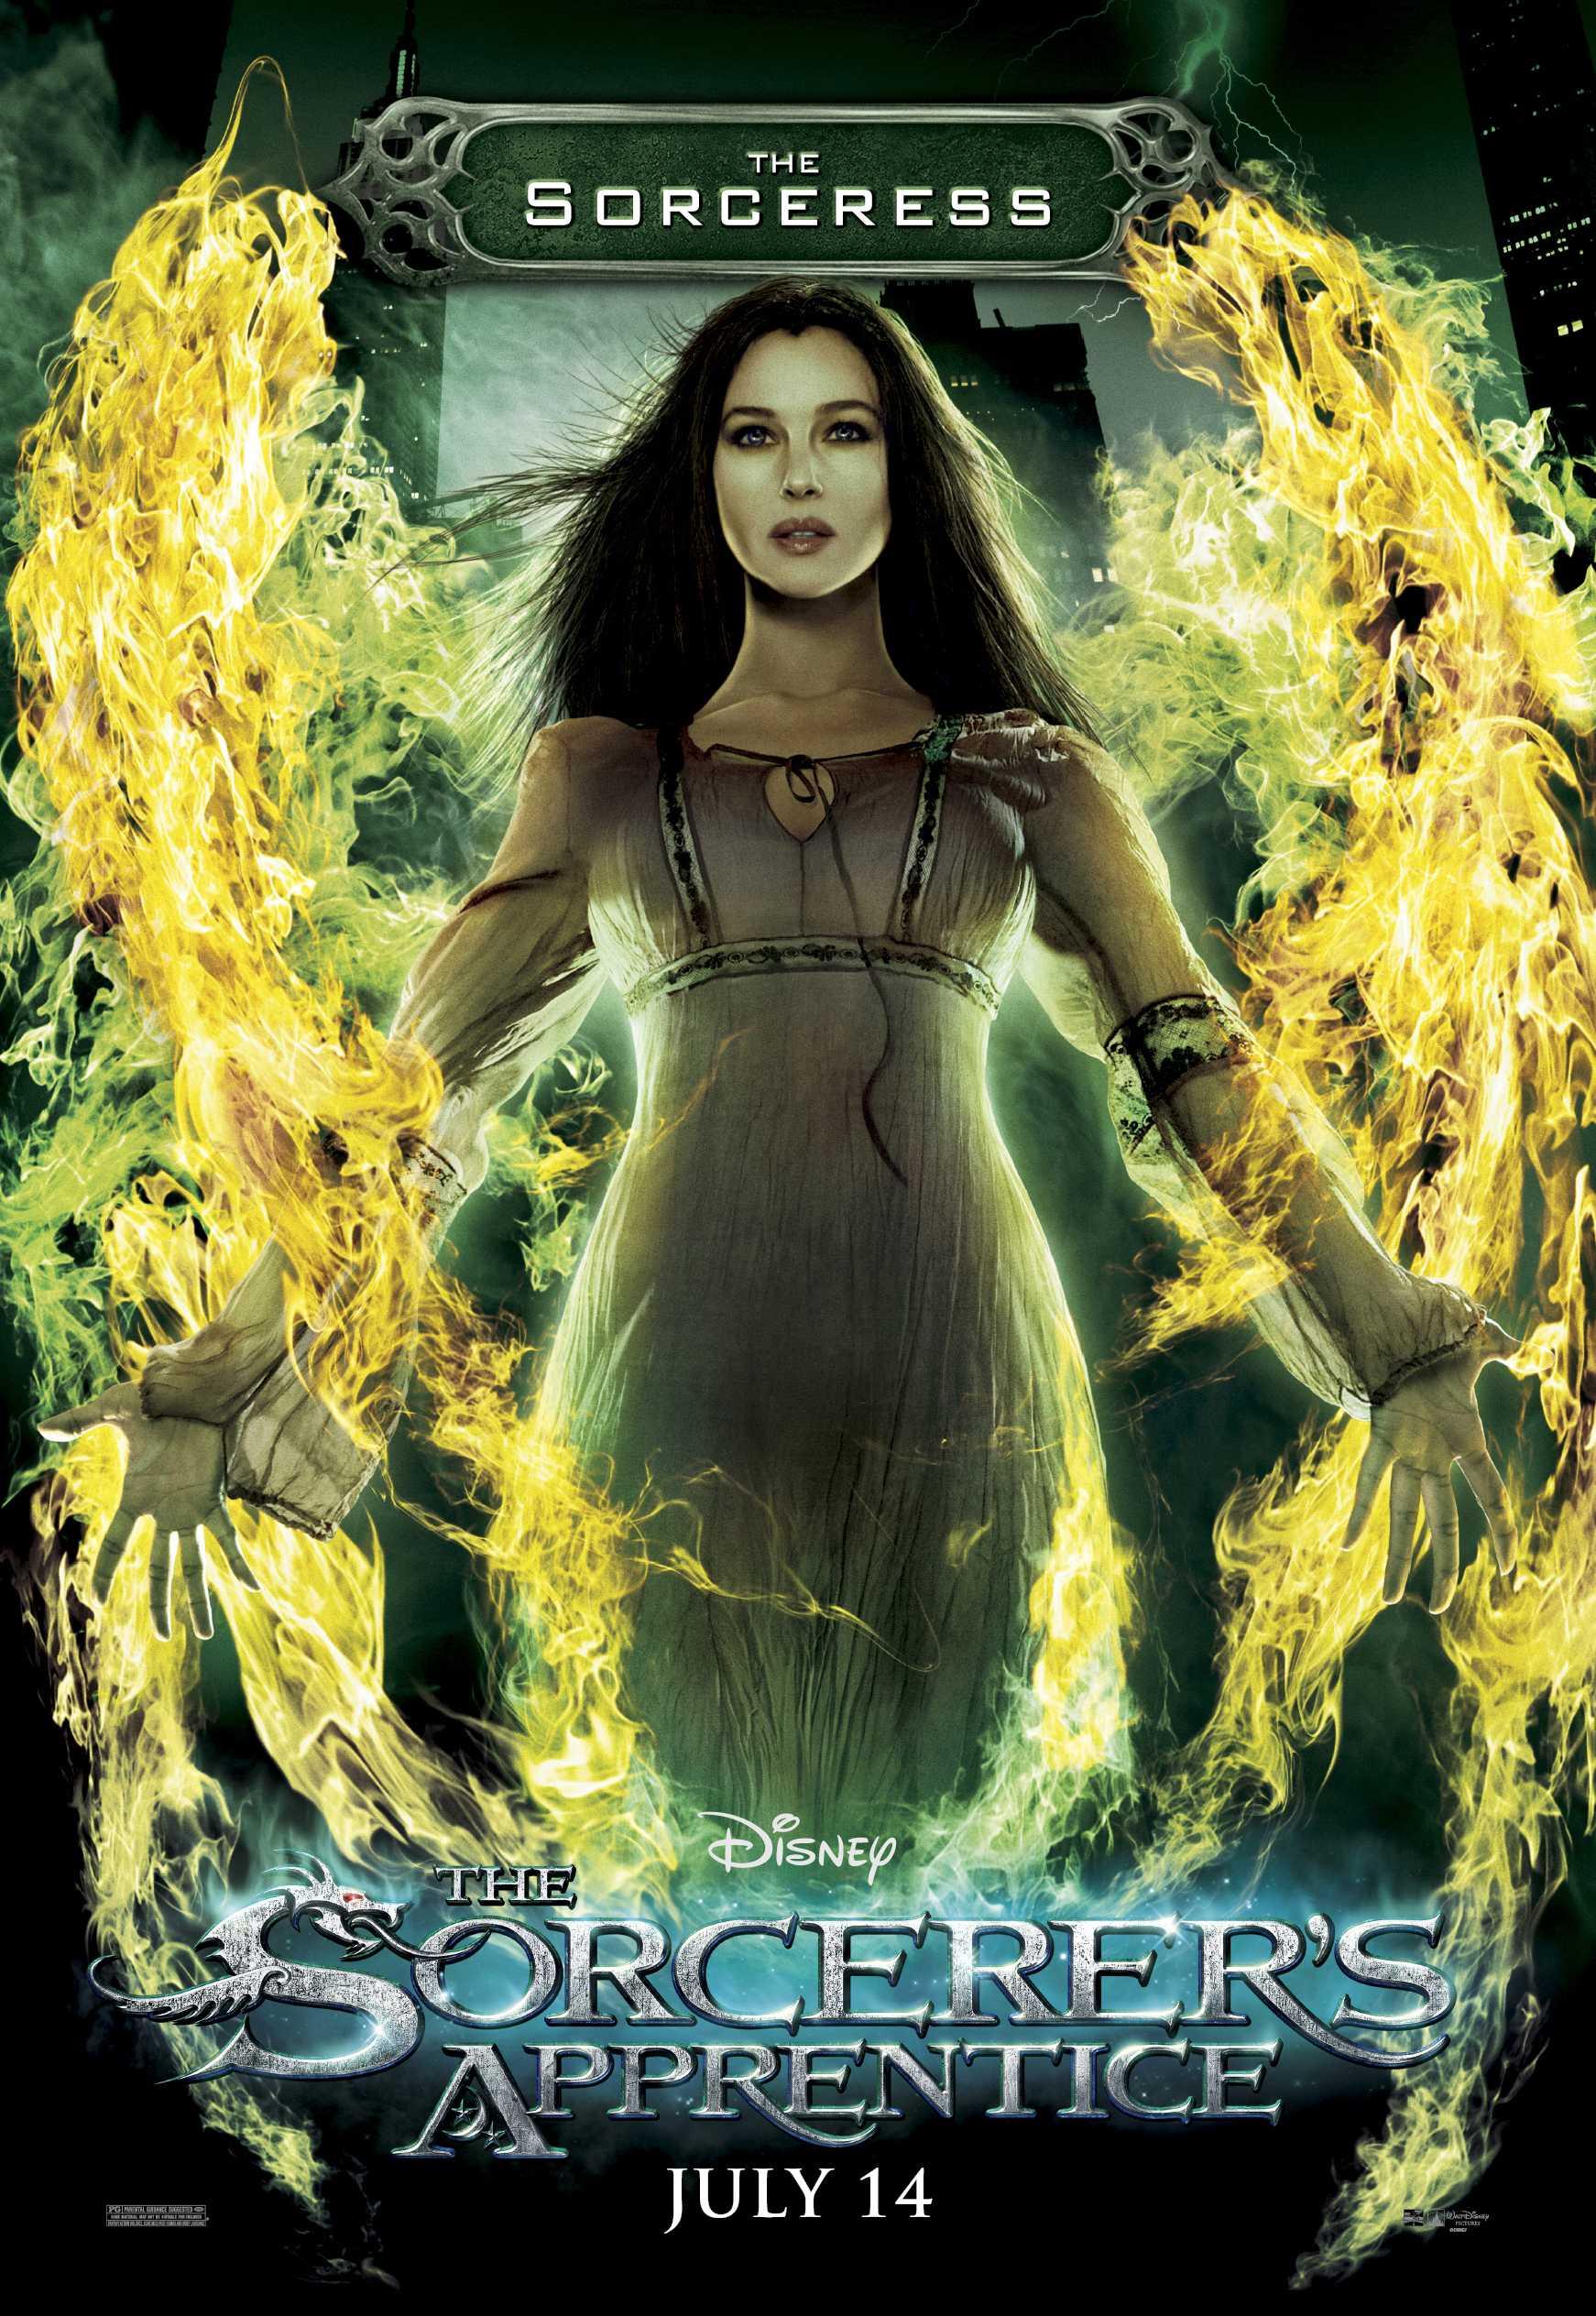 sorcerers_apprentice_poster_2010_02.jpg